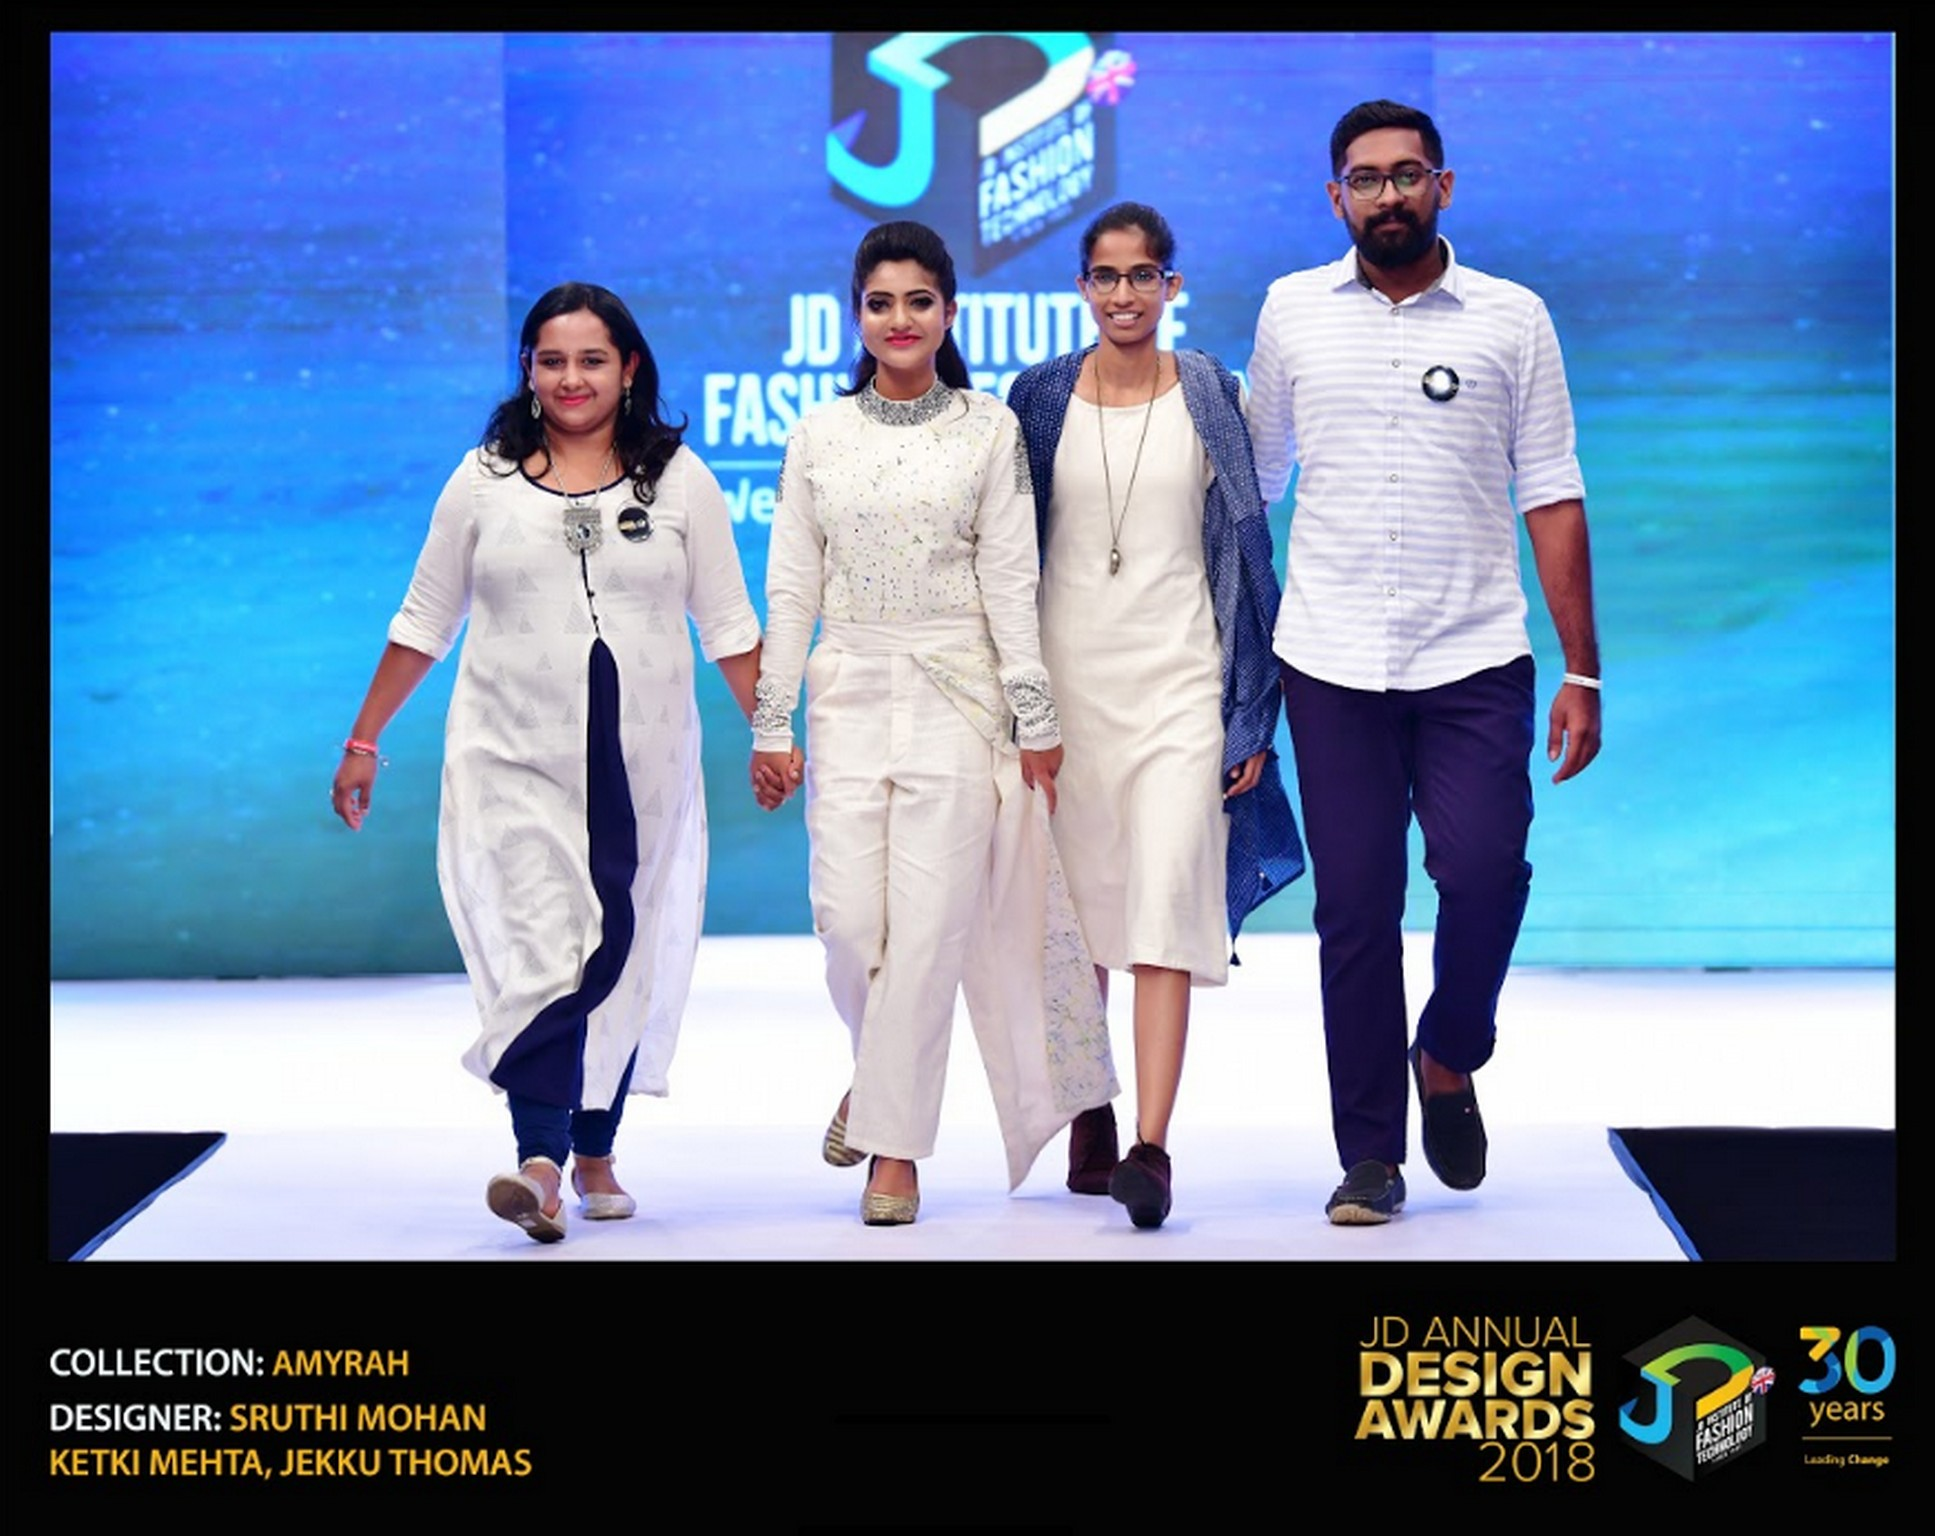 amyrah - AMYRAH 14 - AMYRAH – Change – JD Annual Design Awards 2018